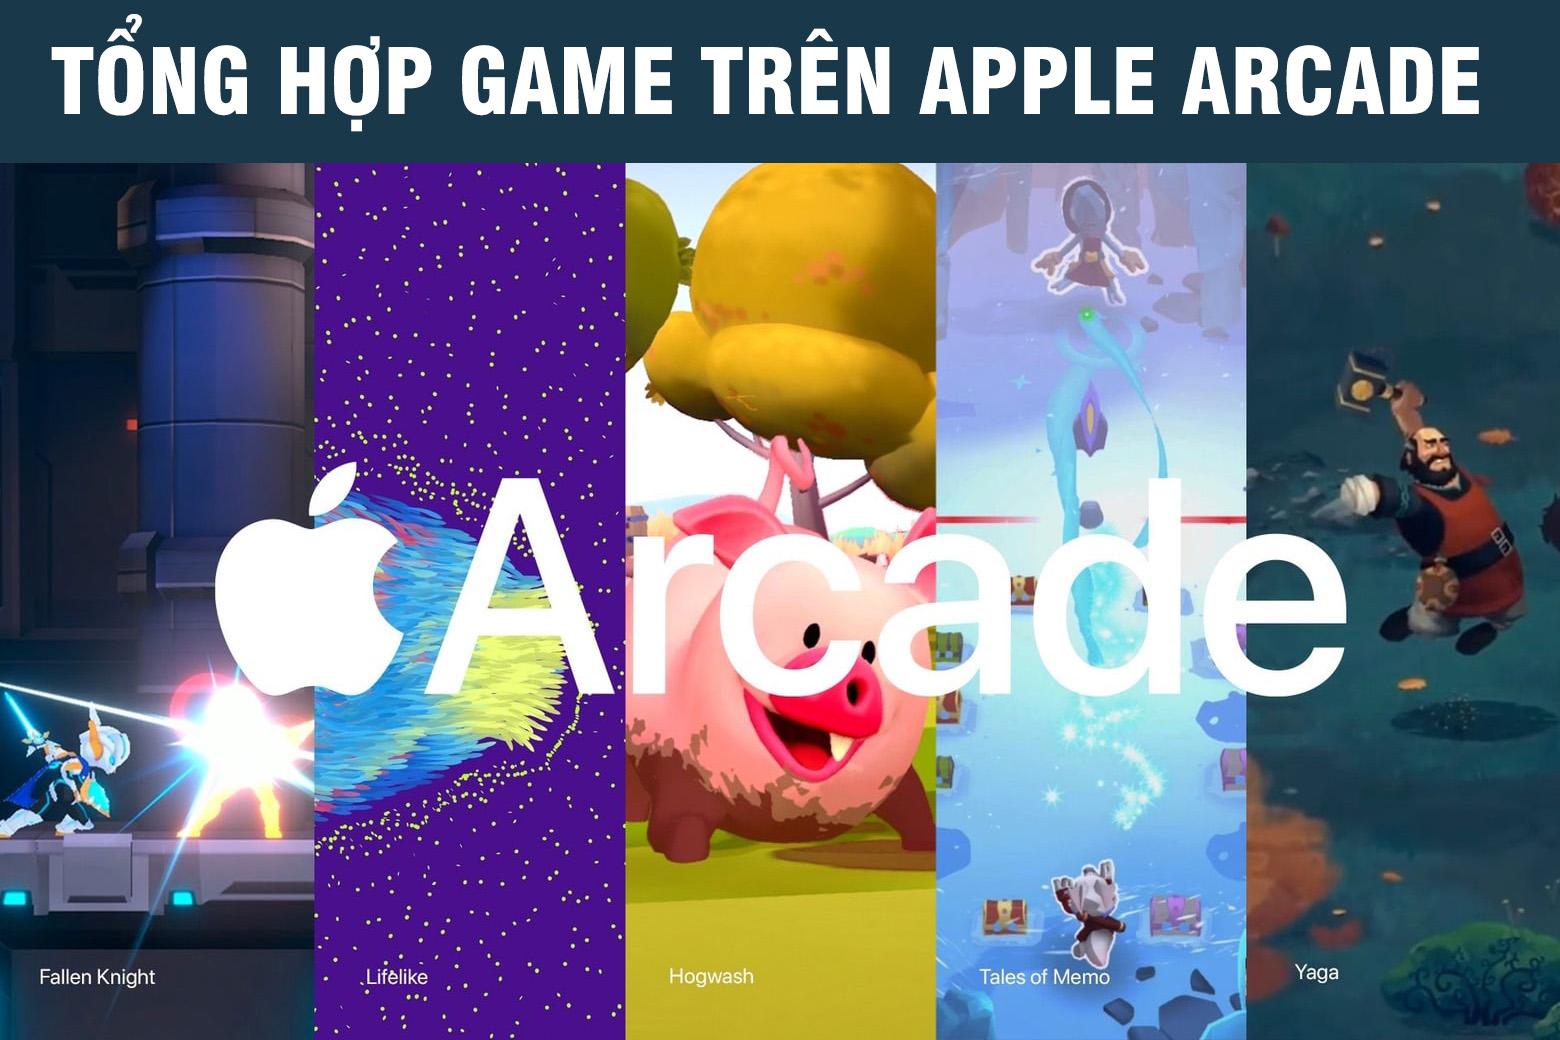 #2021 Apple Arcade Collection – Tổng hợp một số game trên Apple Arcade